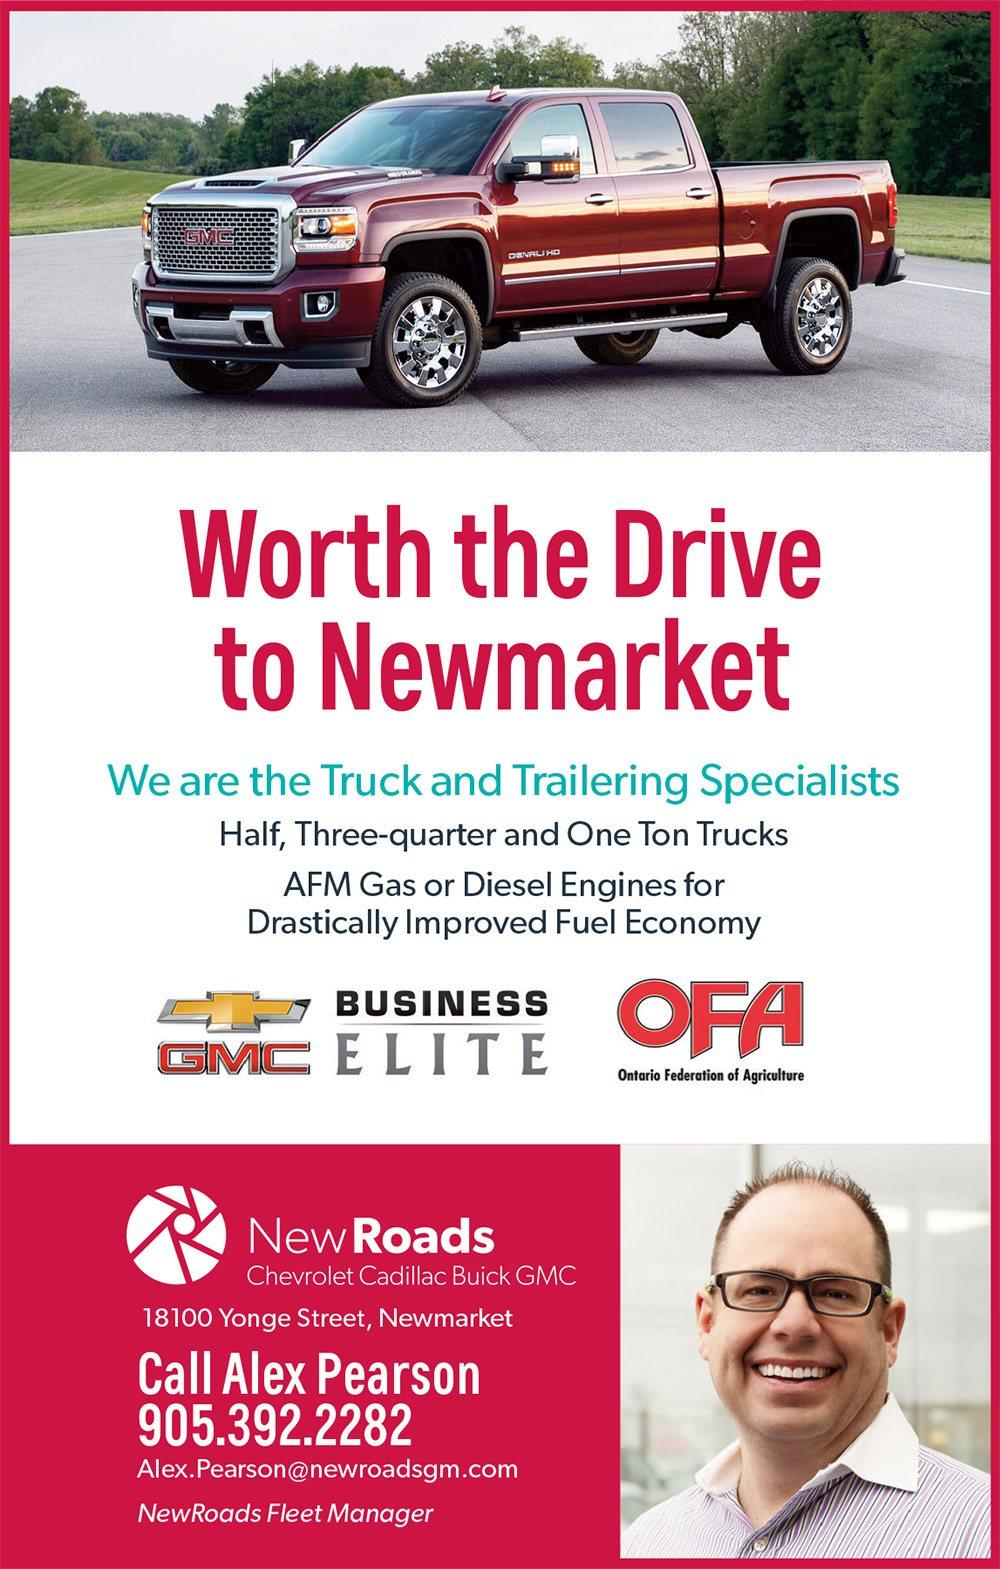 NewRoads Business Elite OFA Fleet in Newmarket